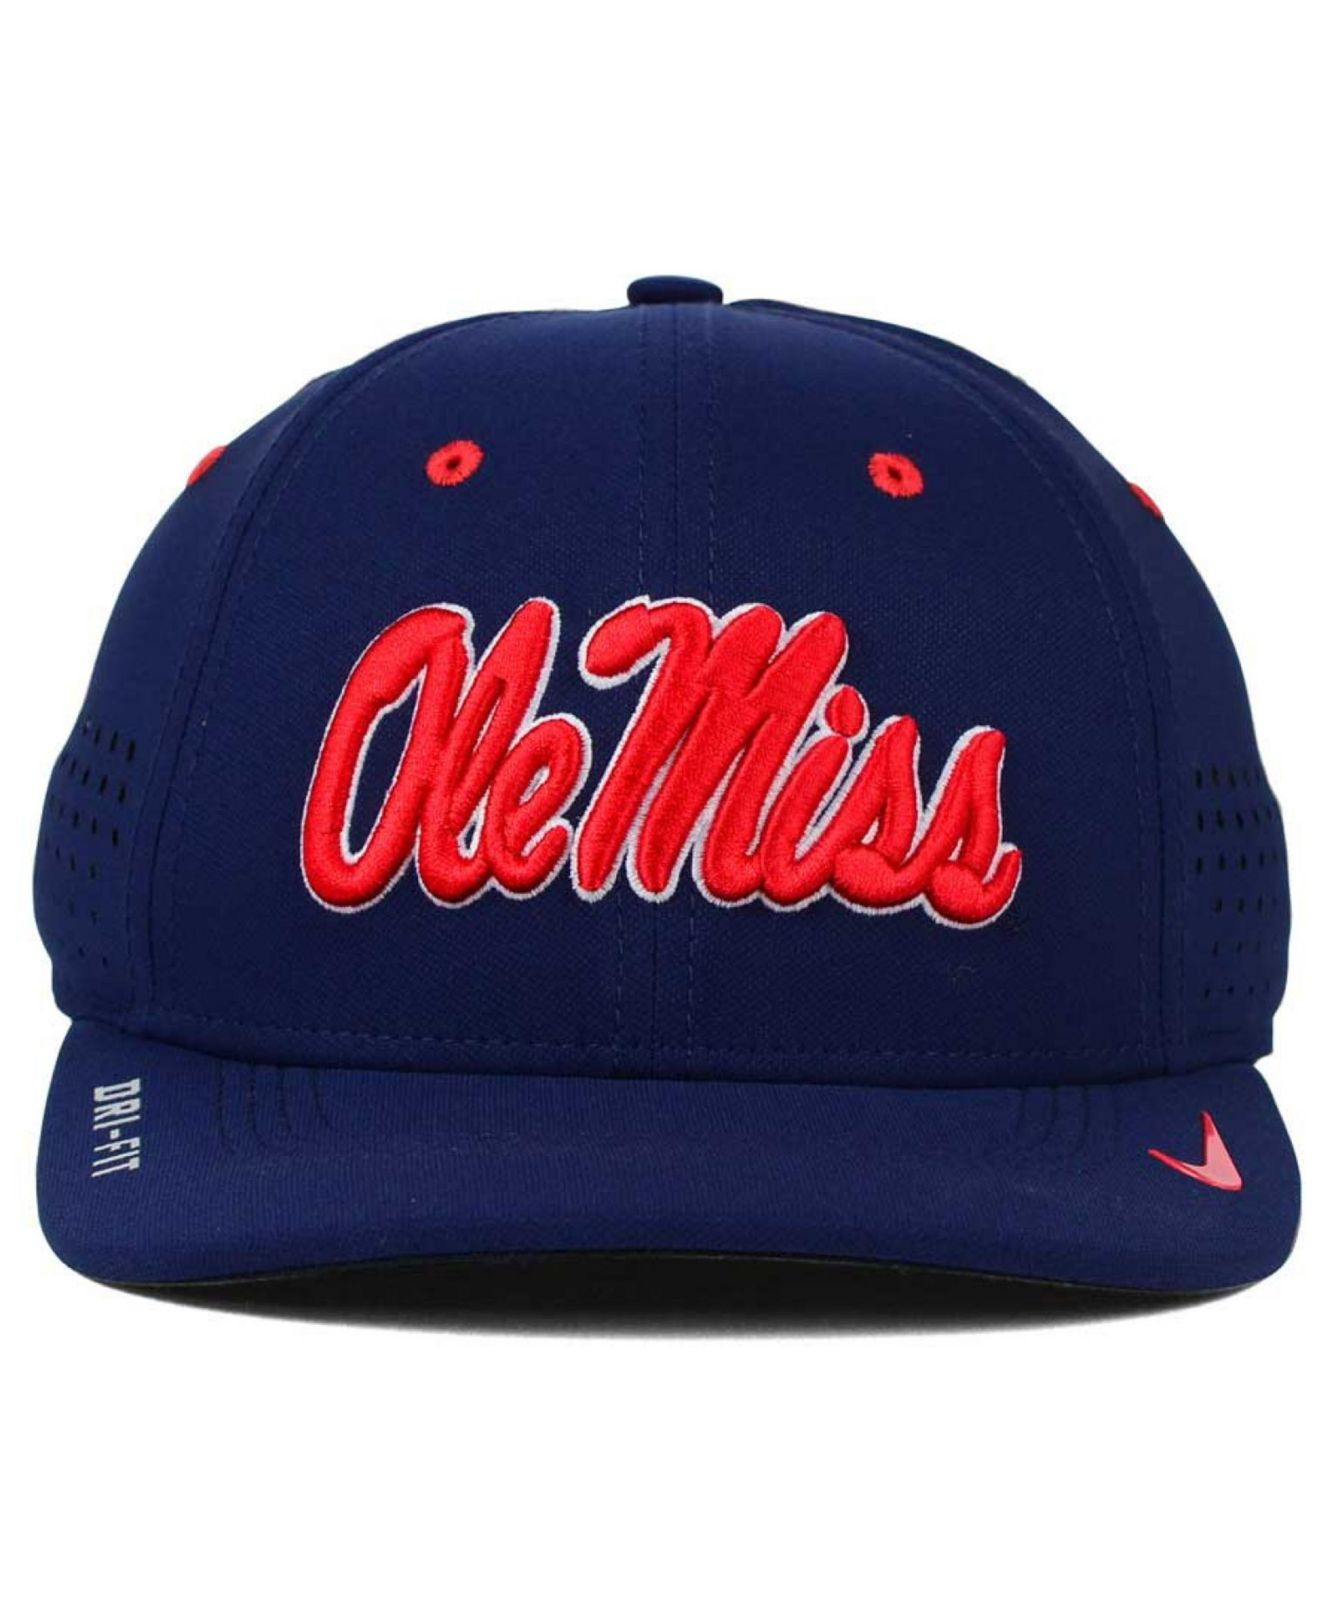 promo code 3b52b ac97e Lyst - Nike Mississippi Rebels Sideline Cap in Blue for Men